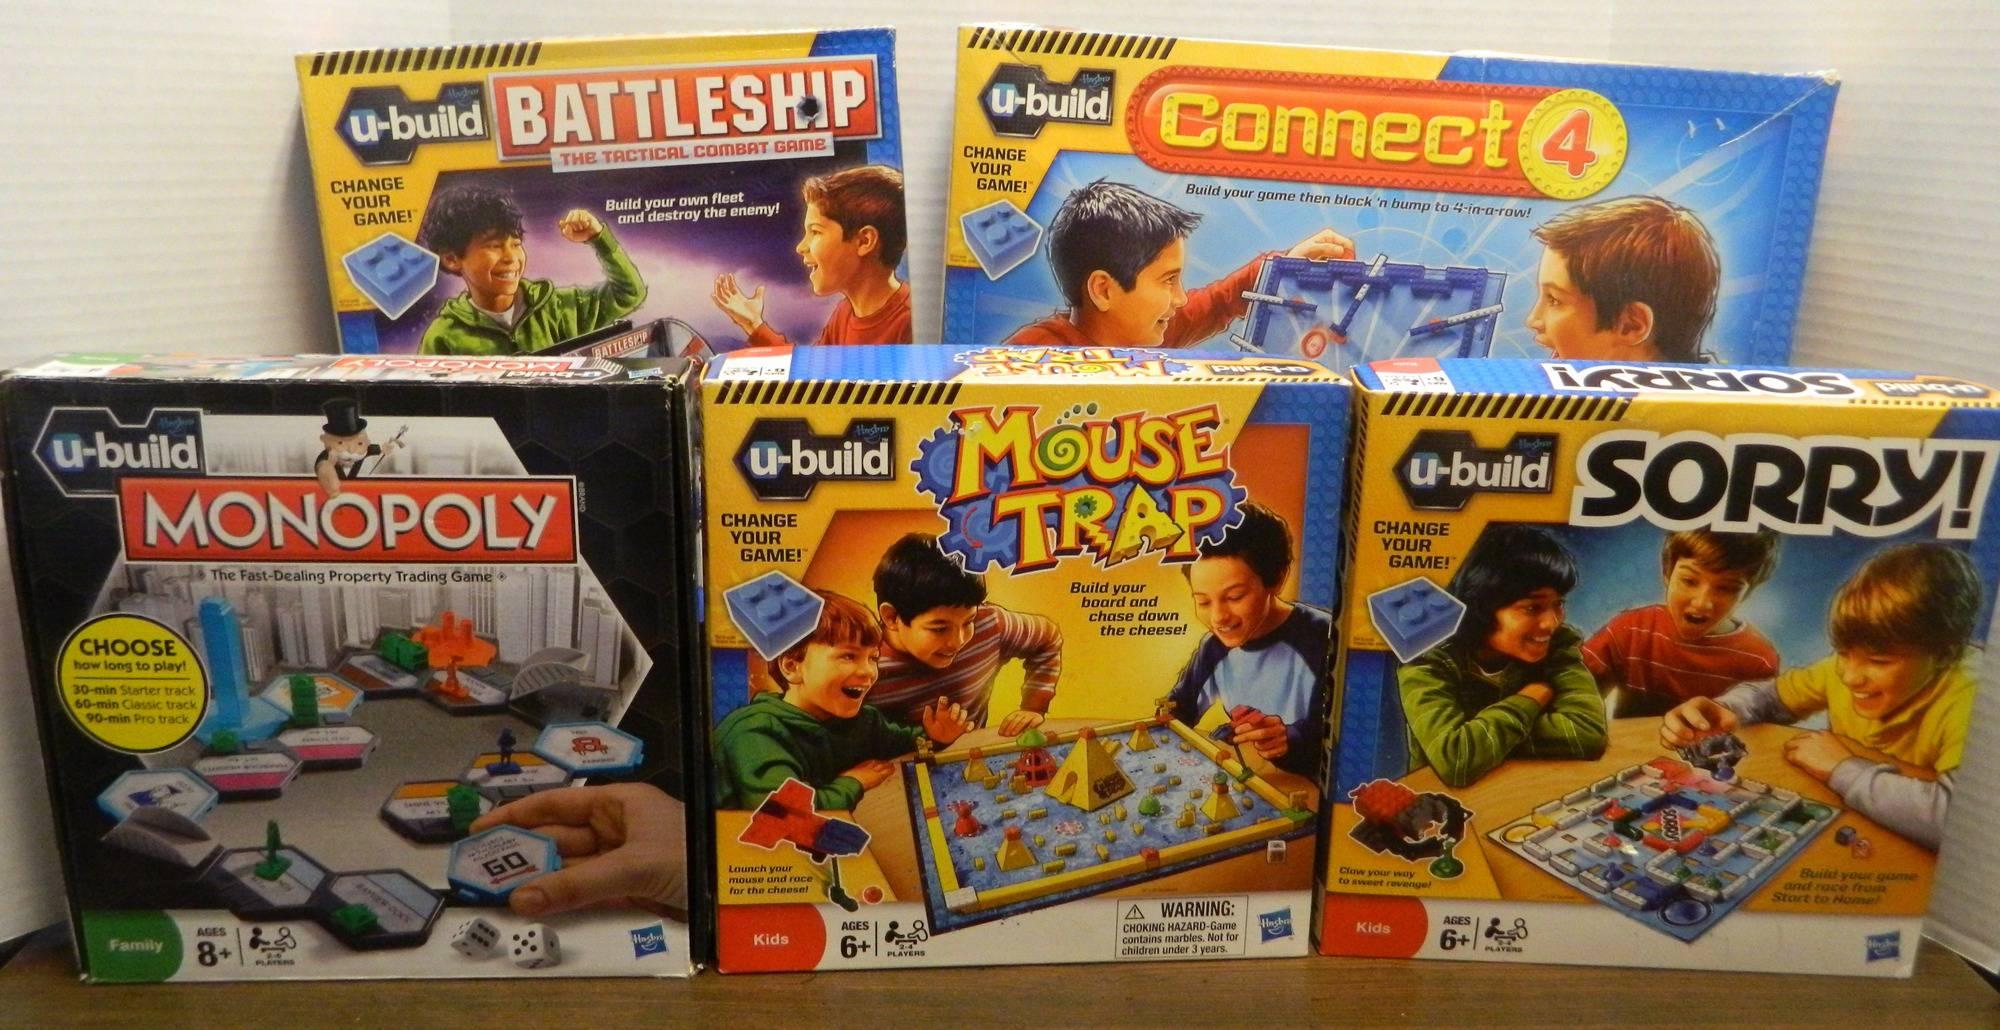 Hasbro's U-Build Games